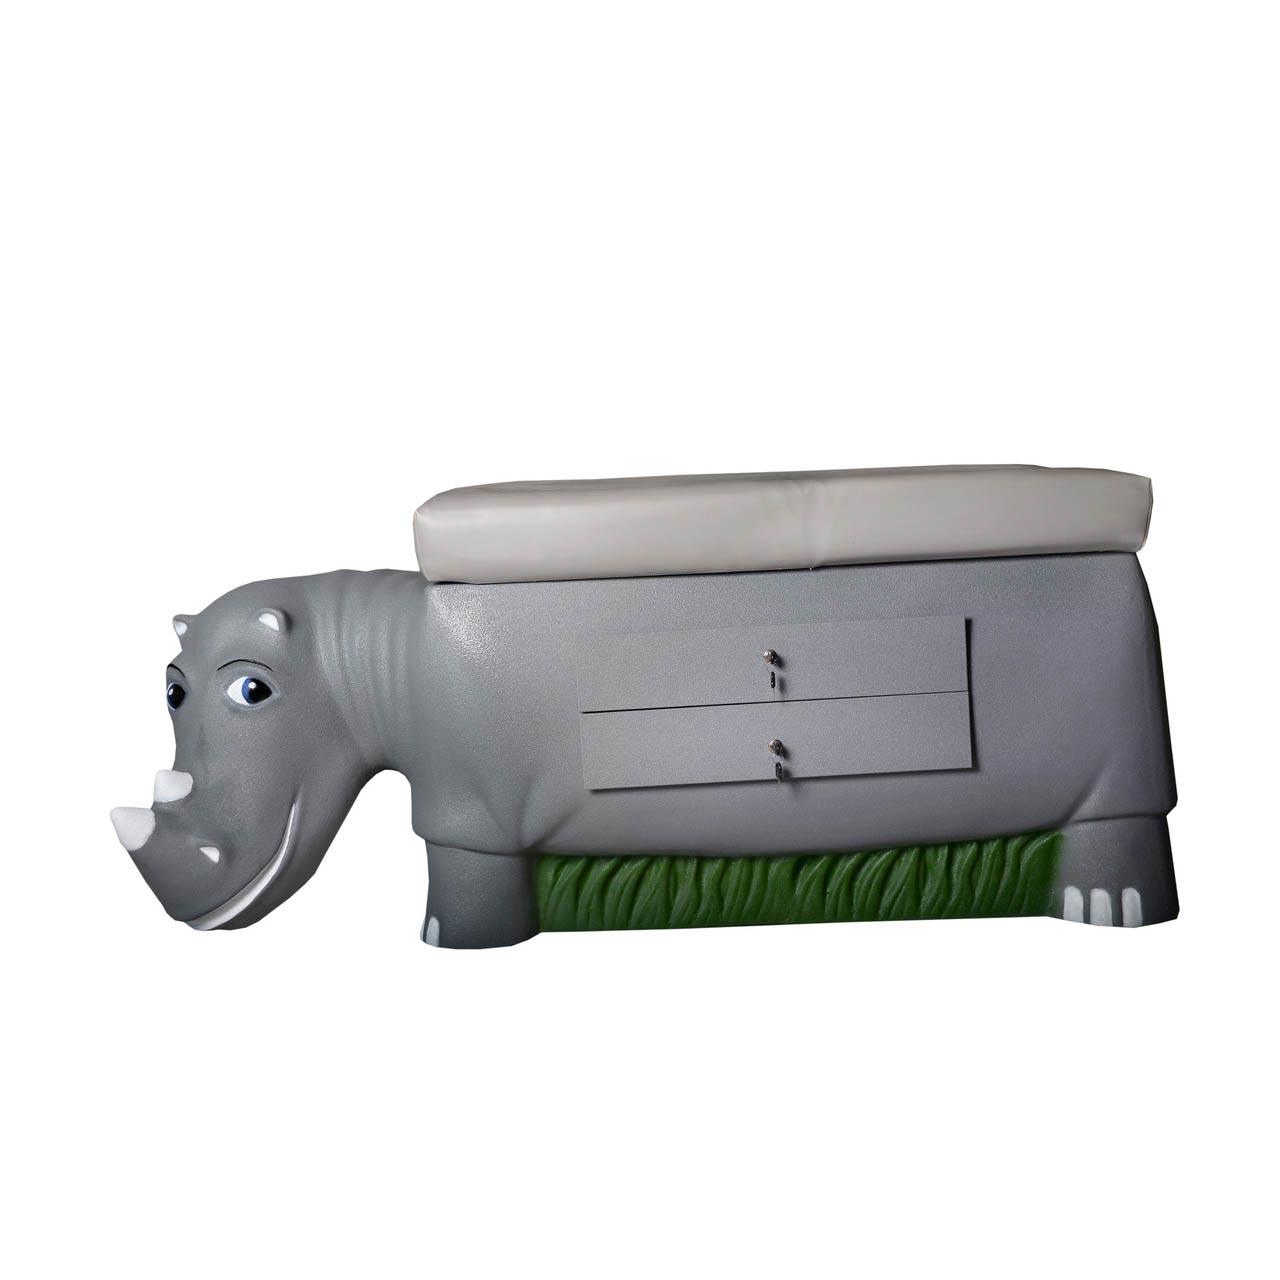 Pedia Pals 7200DT Zoopal Rhino pediatric exam table